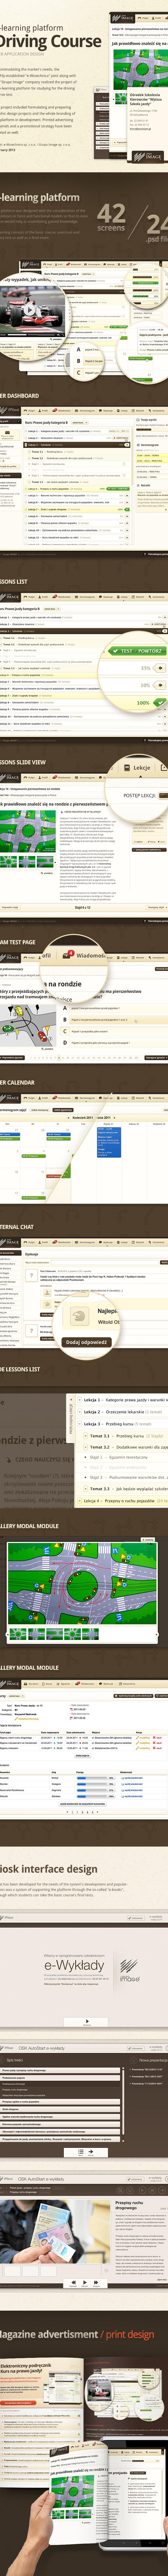 Webdesign,webapp,UI,Platform,eLearning,drivinglicense,rzmota